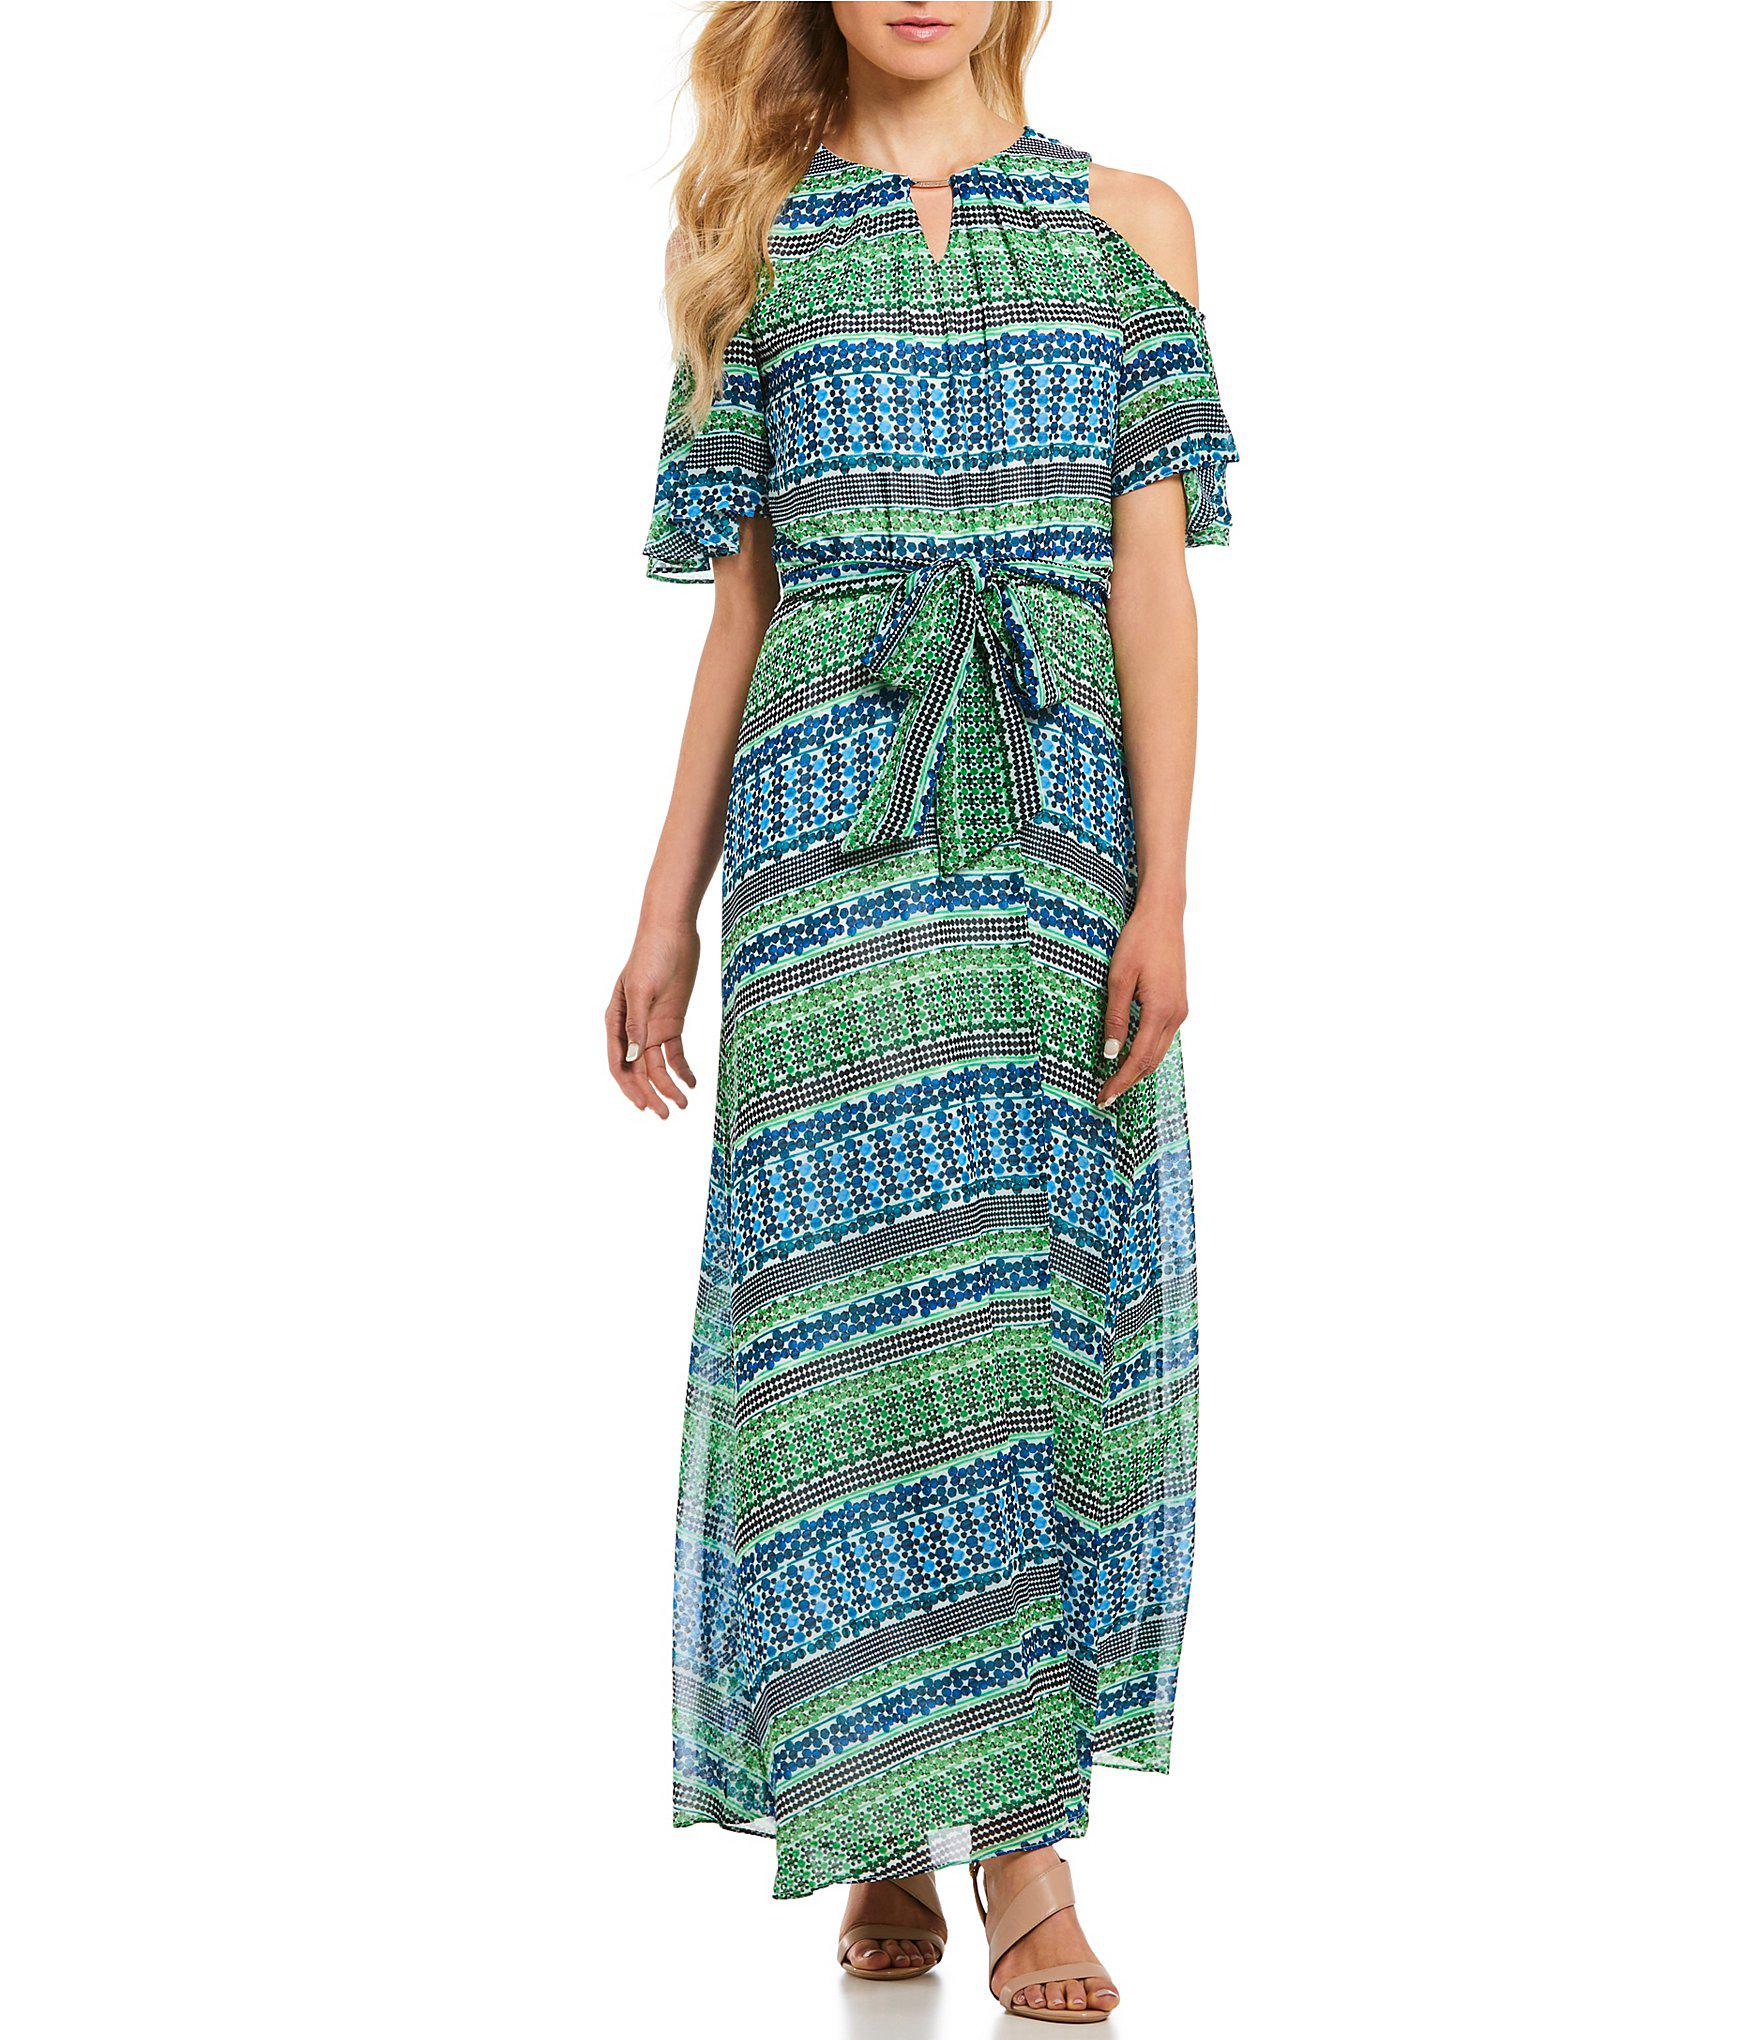 fd31fea62 Lyst - Calvin Klein Tile Stripe Print Halter Neck Cold Shoulder ...